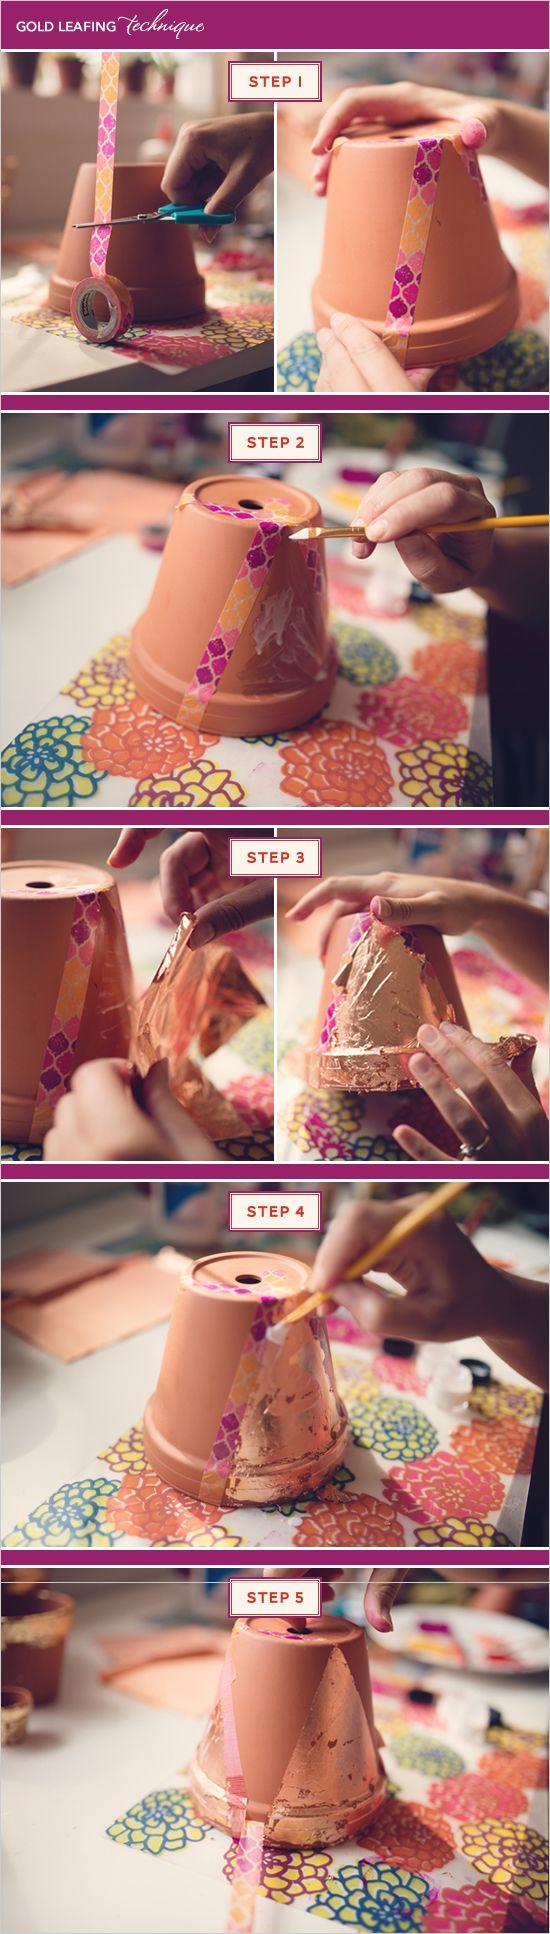 How to apply gold leaf to your own terra cotta pots. #stepbystep #goldleaf #doityourself http://www.weddingchicks.com/2013/10/31/diy-terra-cotta-pots/